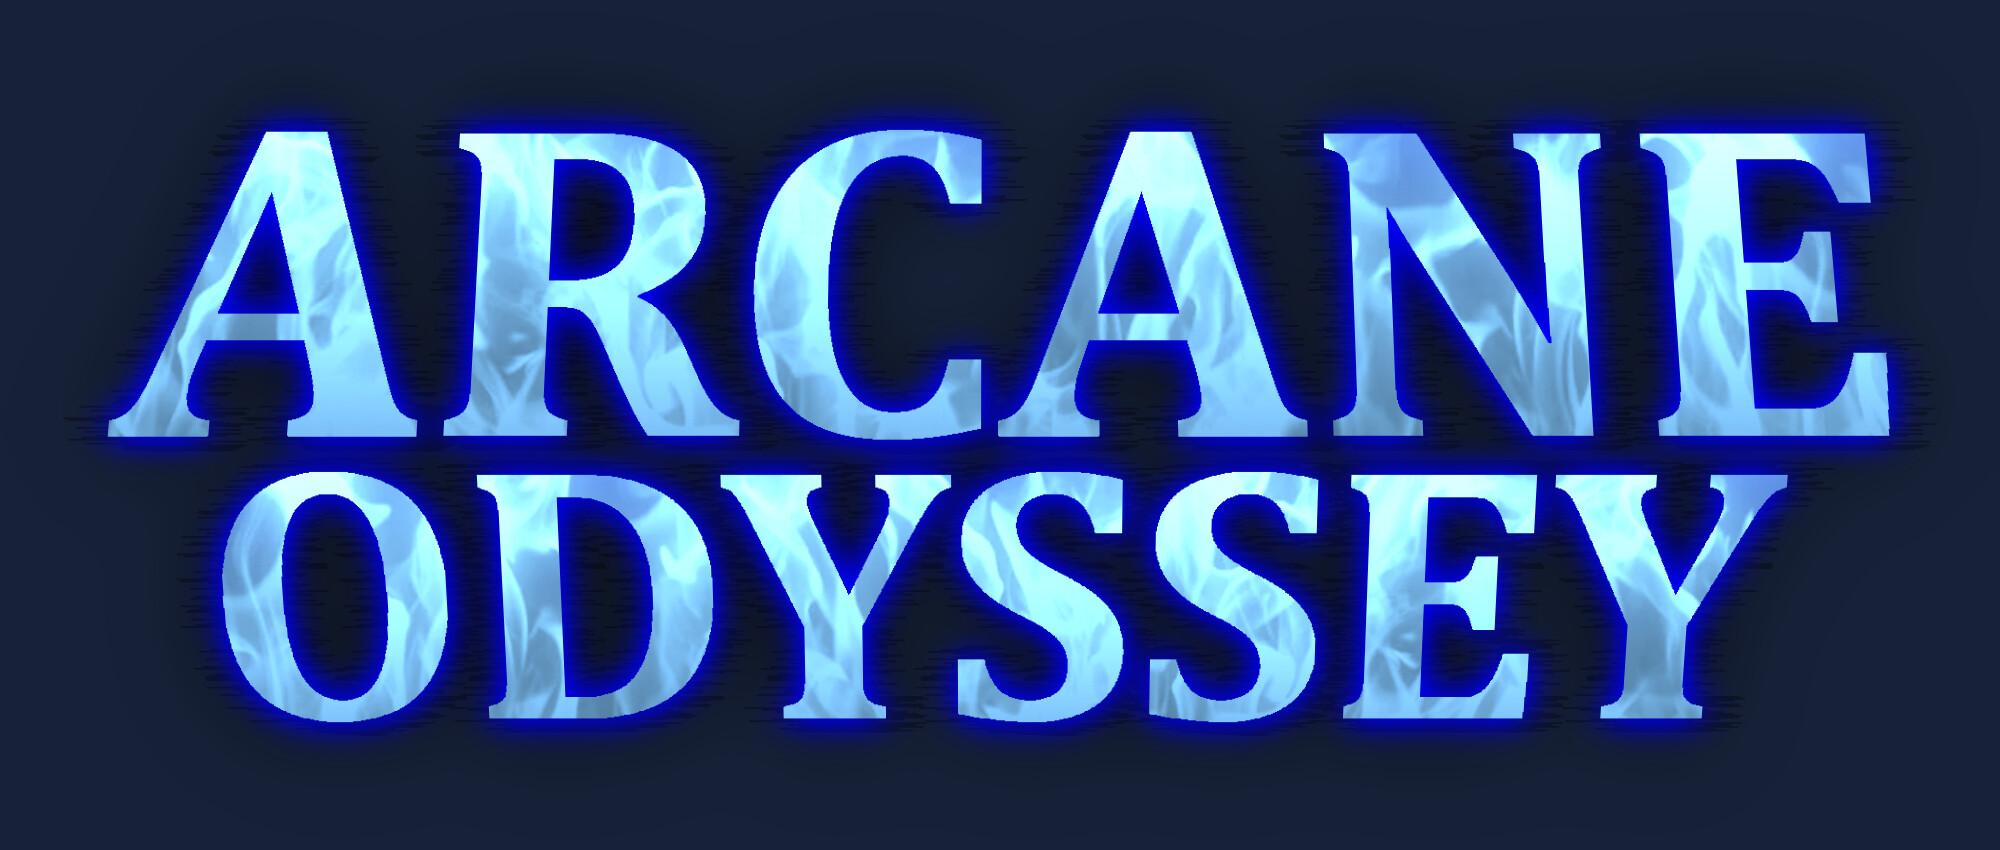 Arcane Odyssey